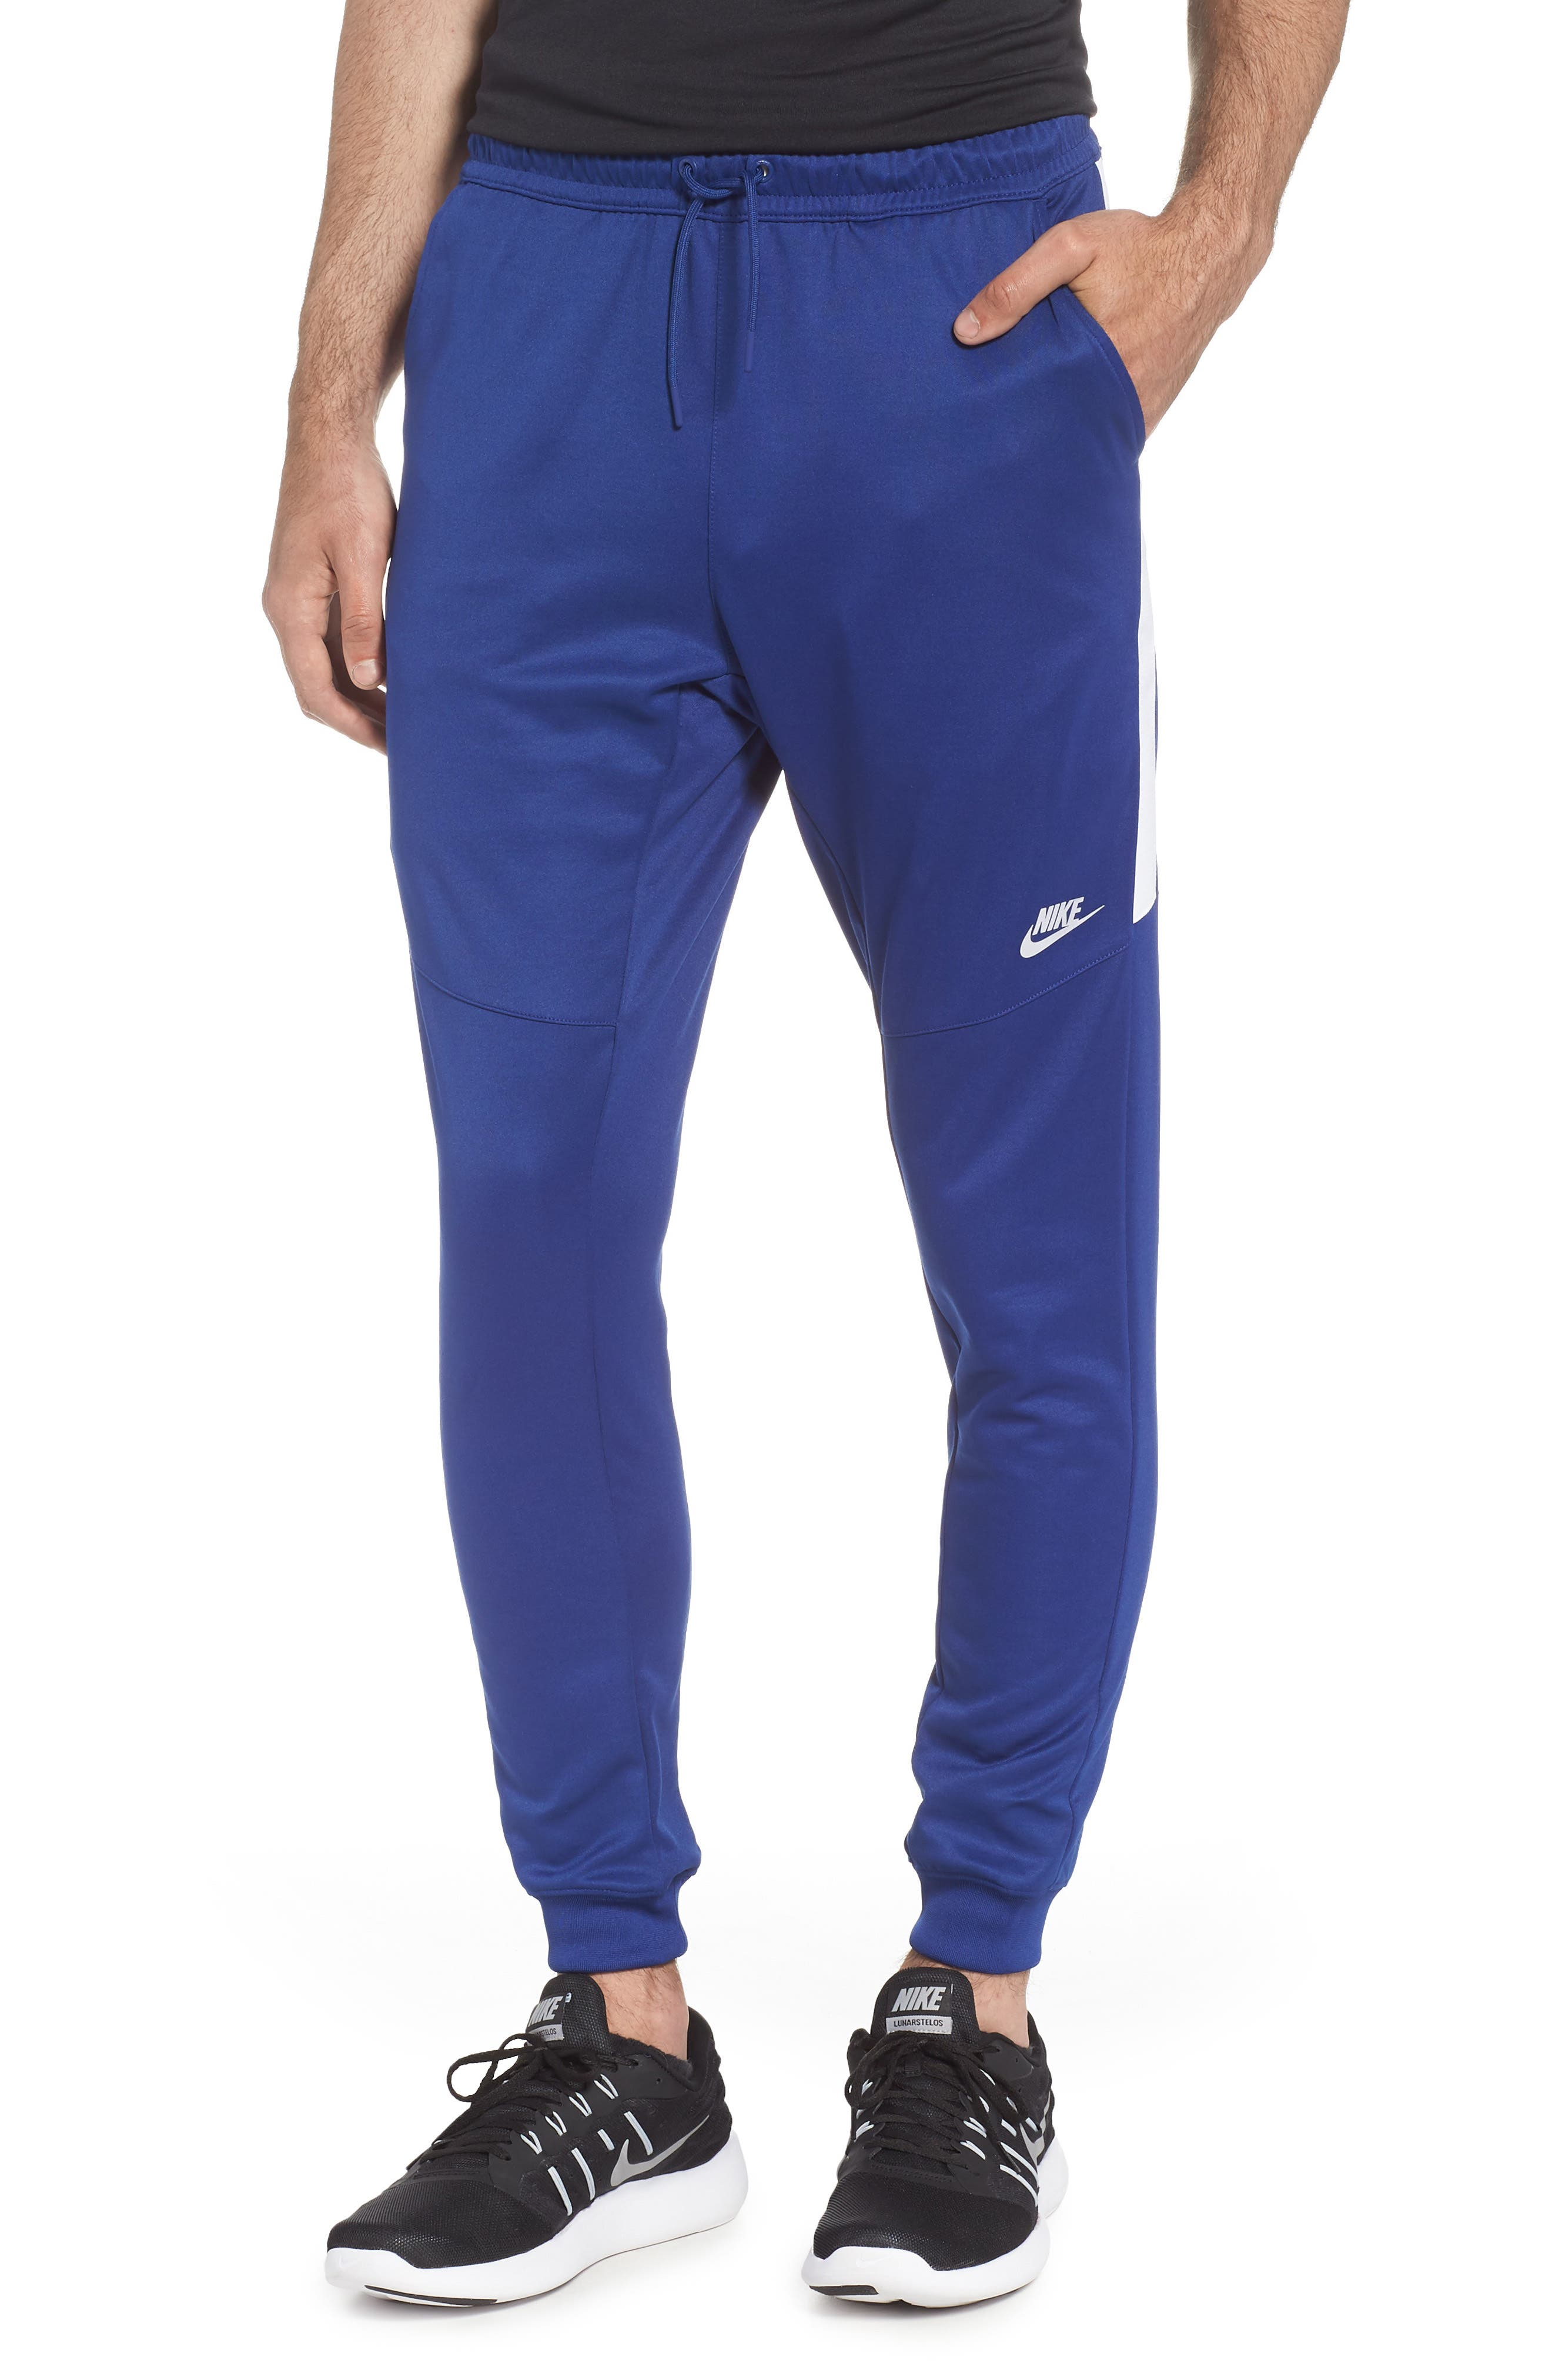 Tribute Jogger Pants,                         Main,                         color, Deep Royal Blue/ White/ White